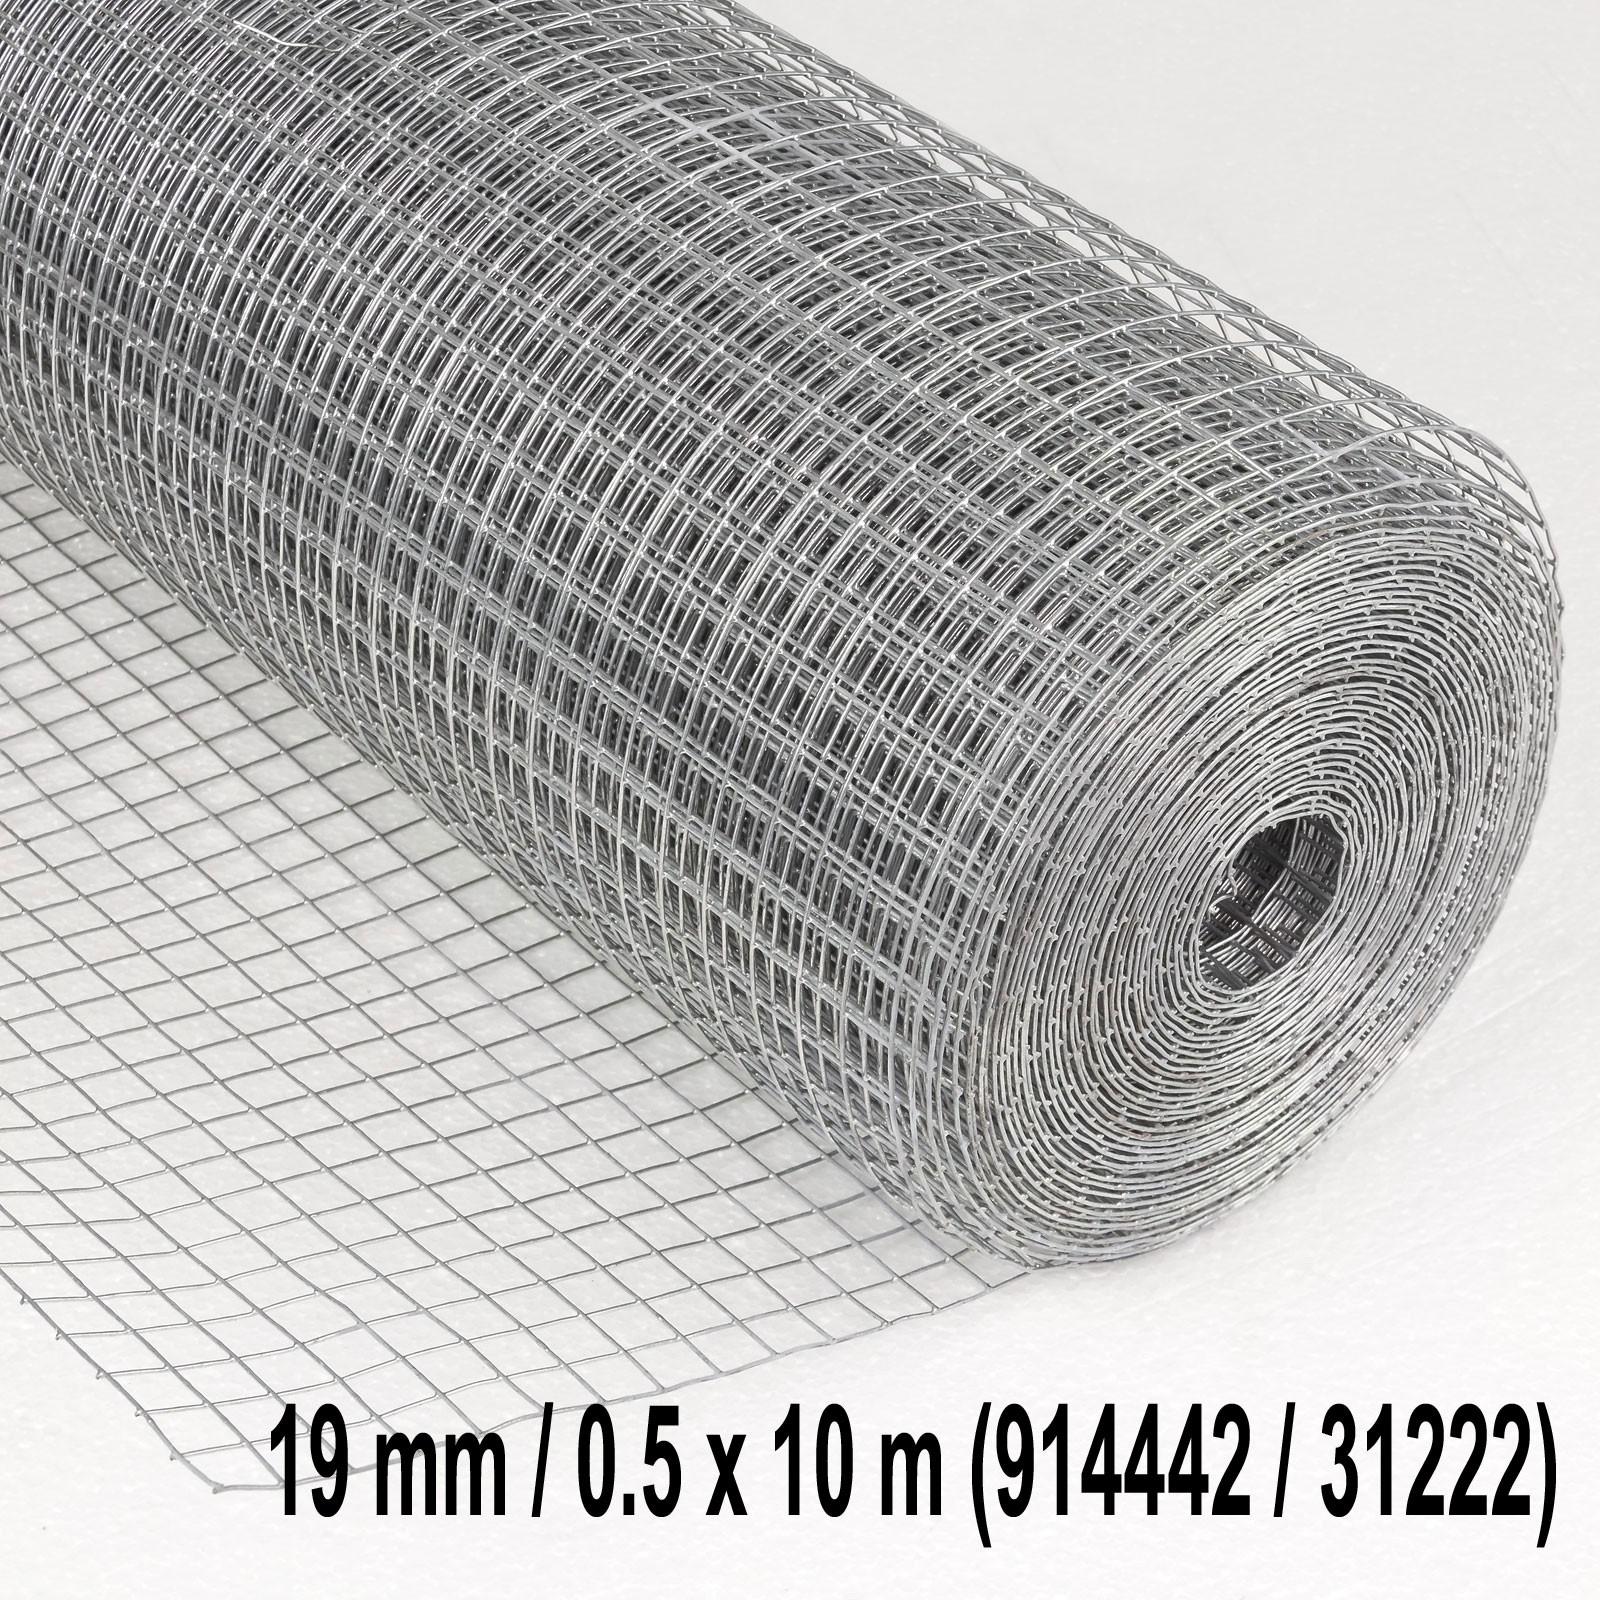 Dema Drahtgitter Volierendraht Maschendraht 13mm oder 19mm 4eck d= 0.8mm verzinkt var-4eckdrahtgitter